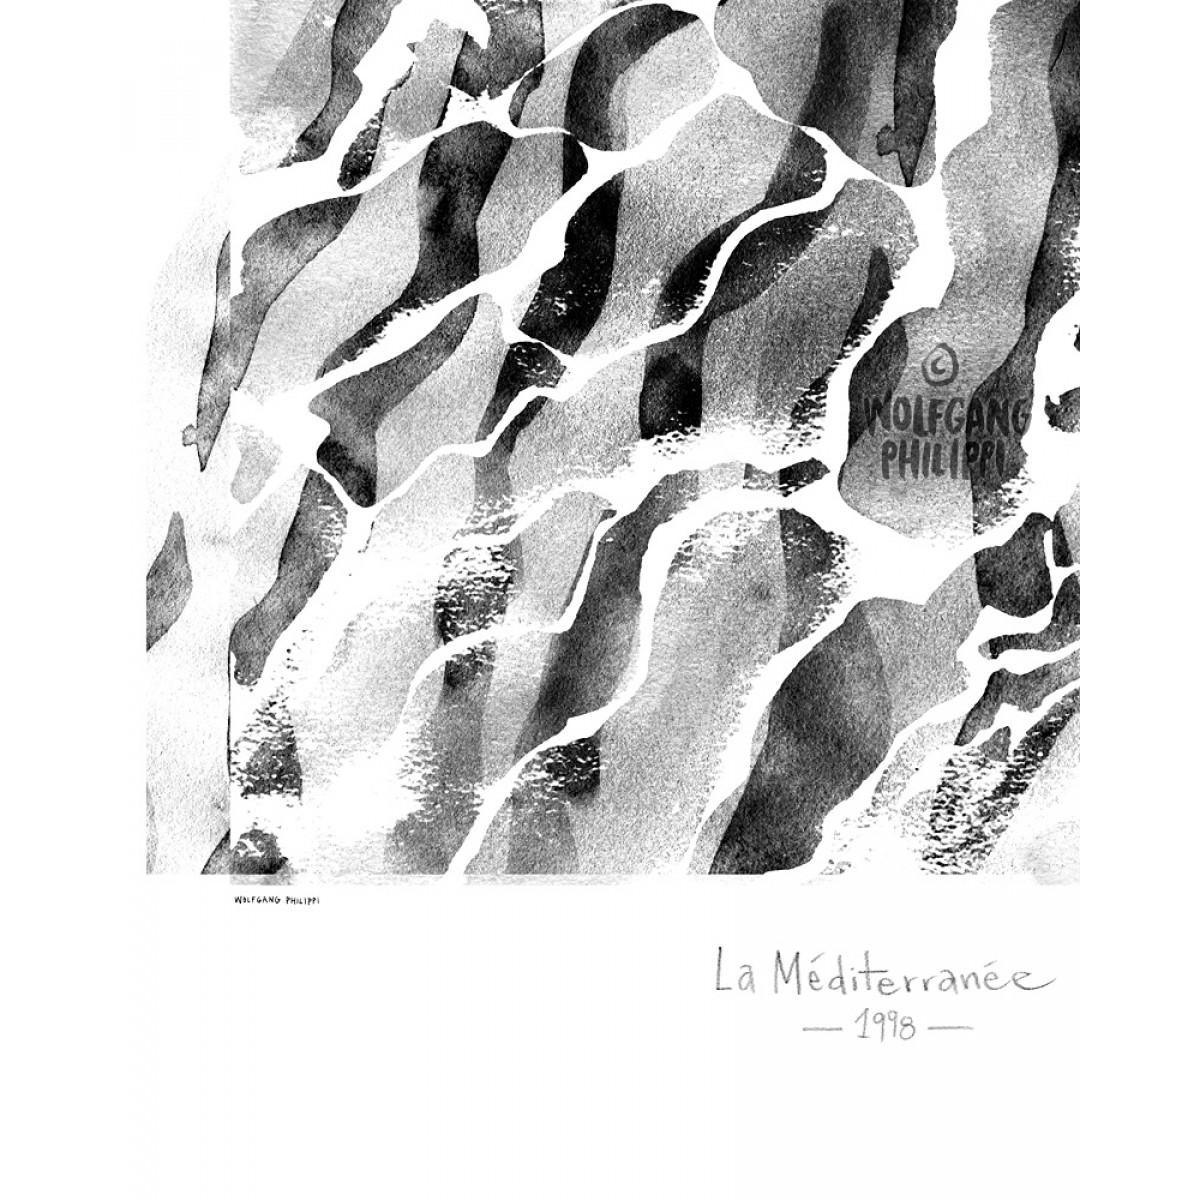 La Méditerranée 1998